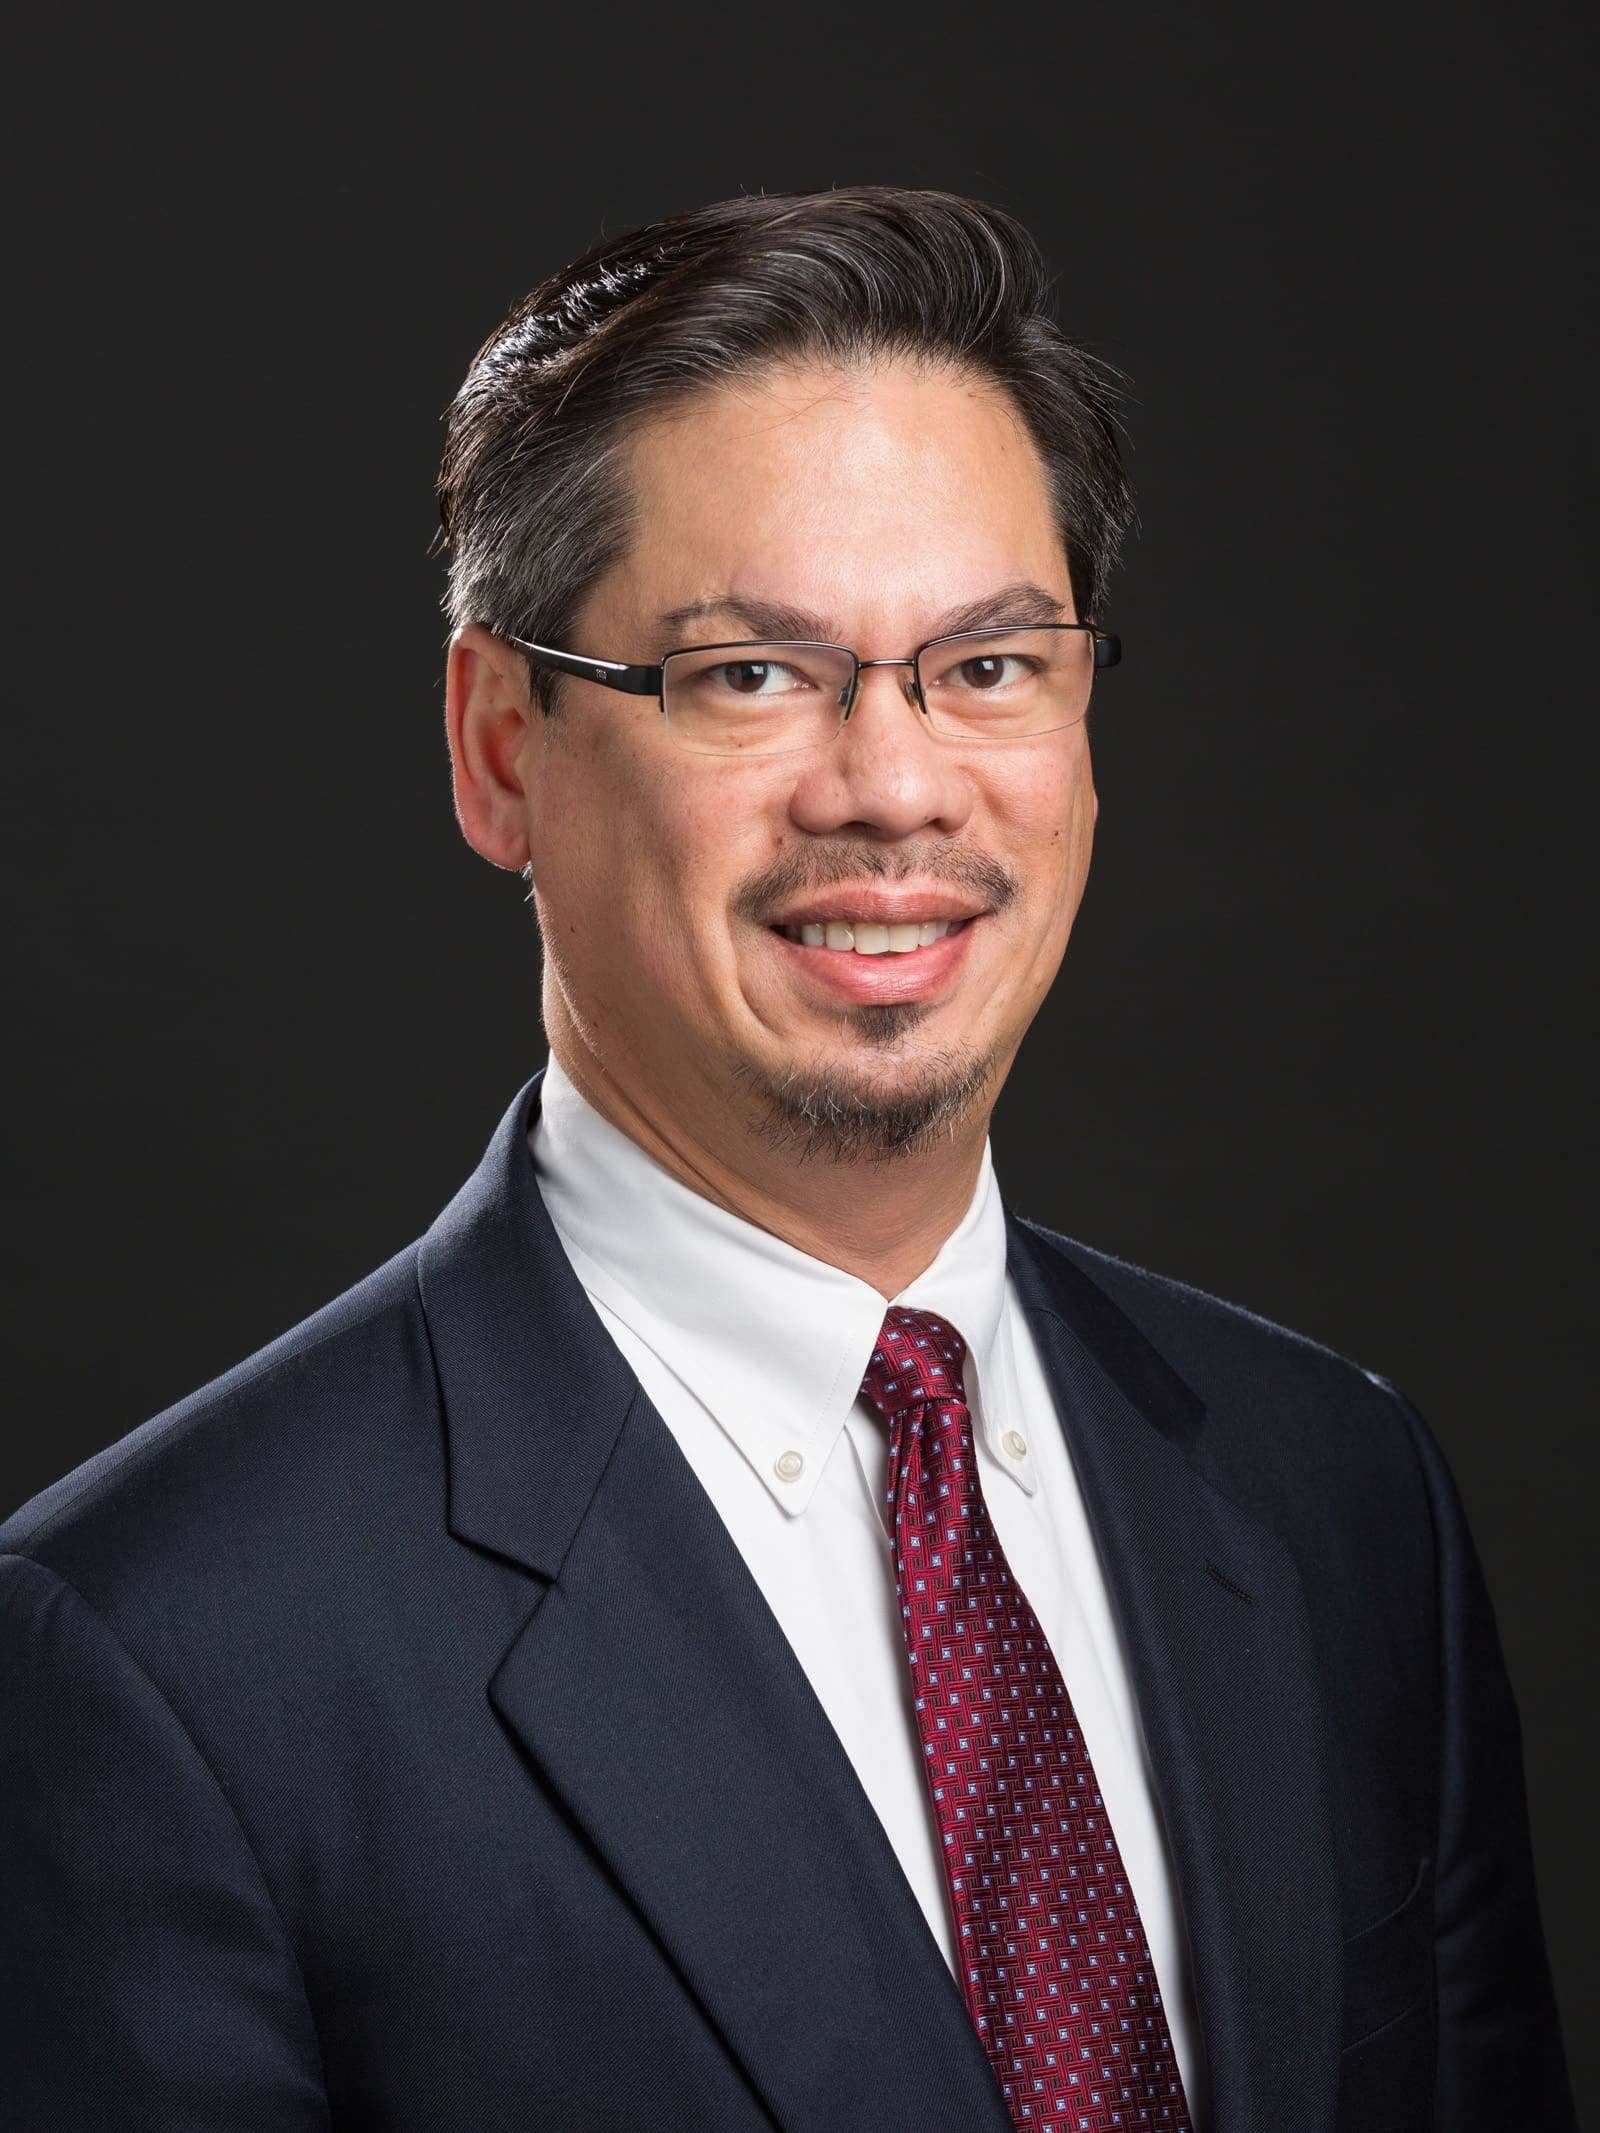 Michael Virata